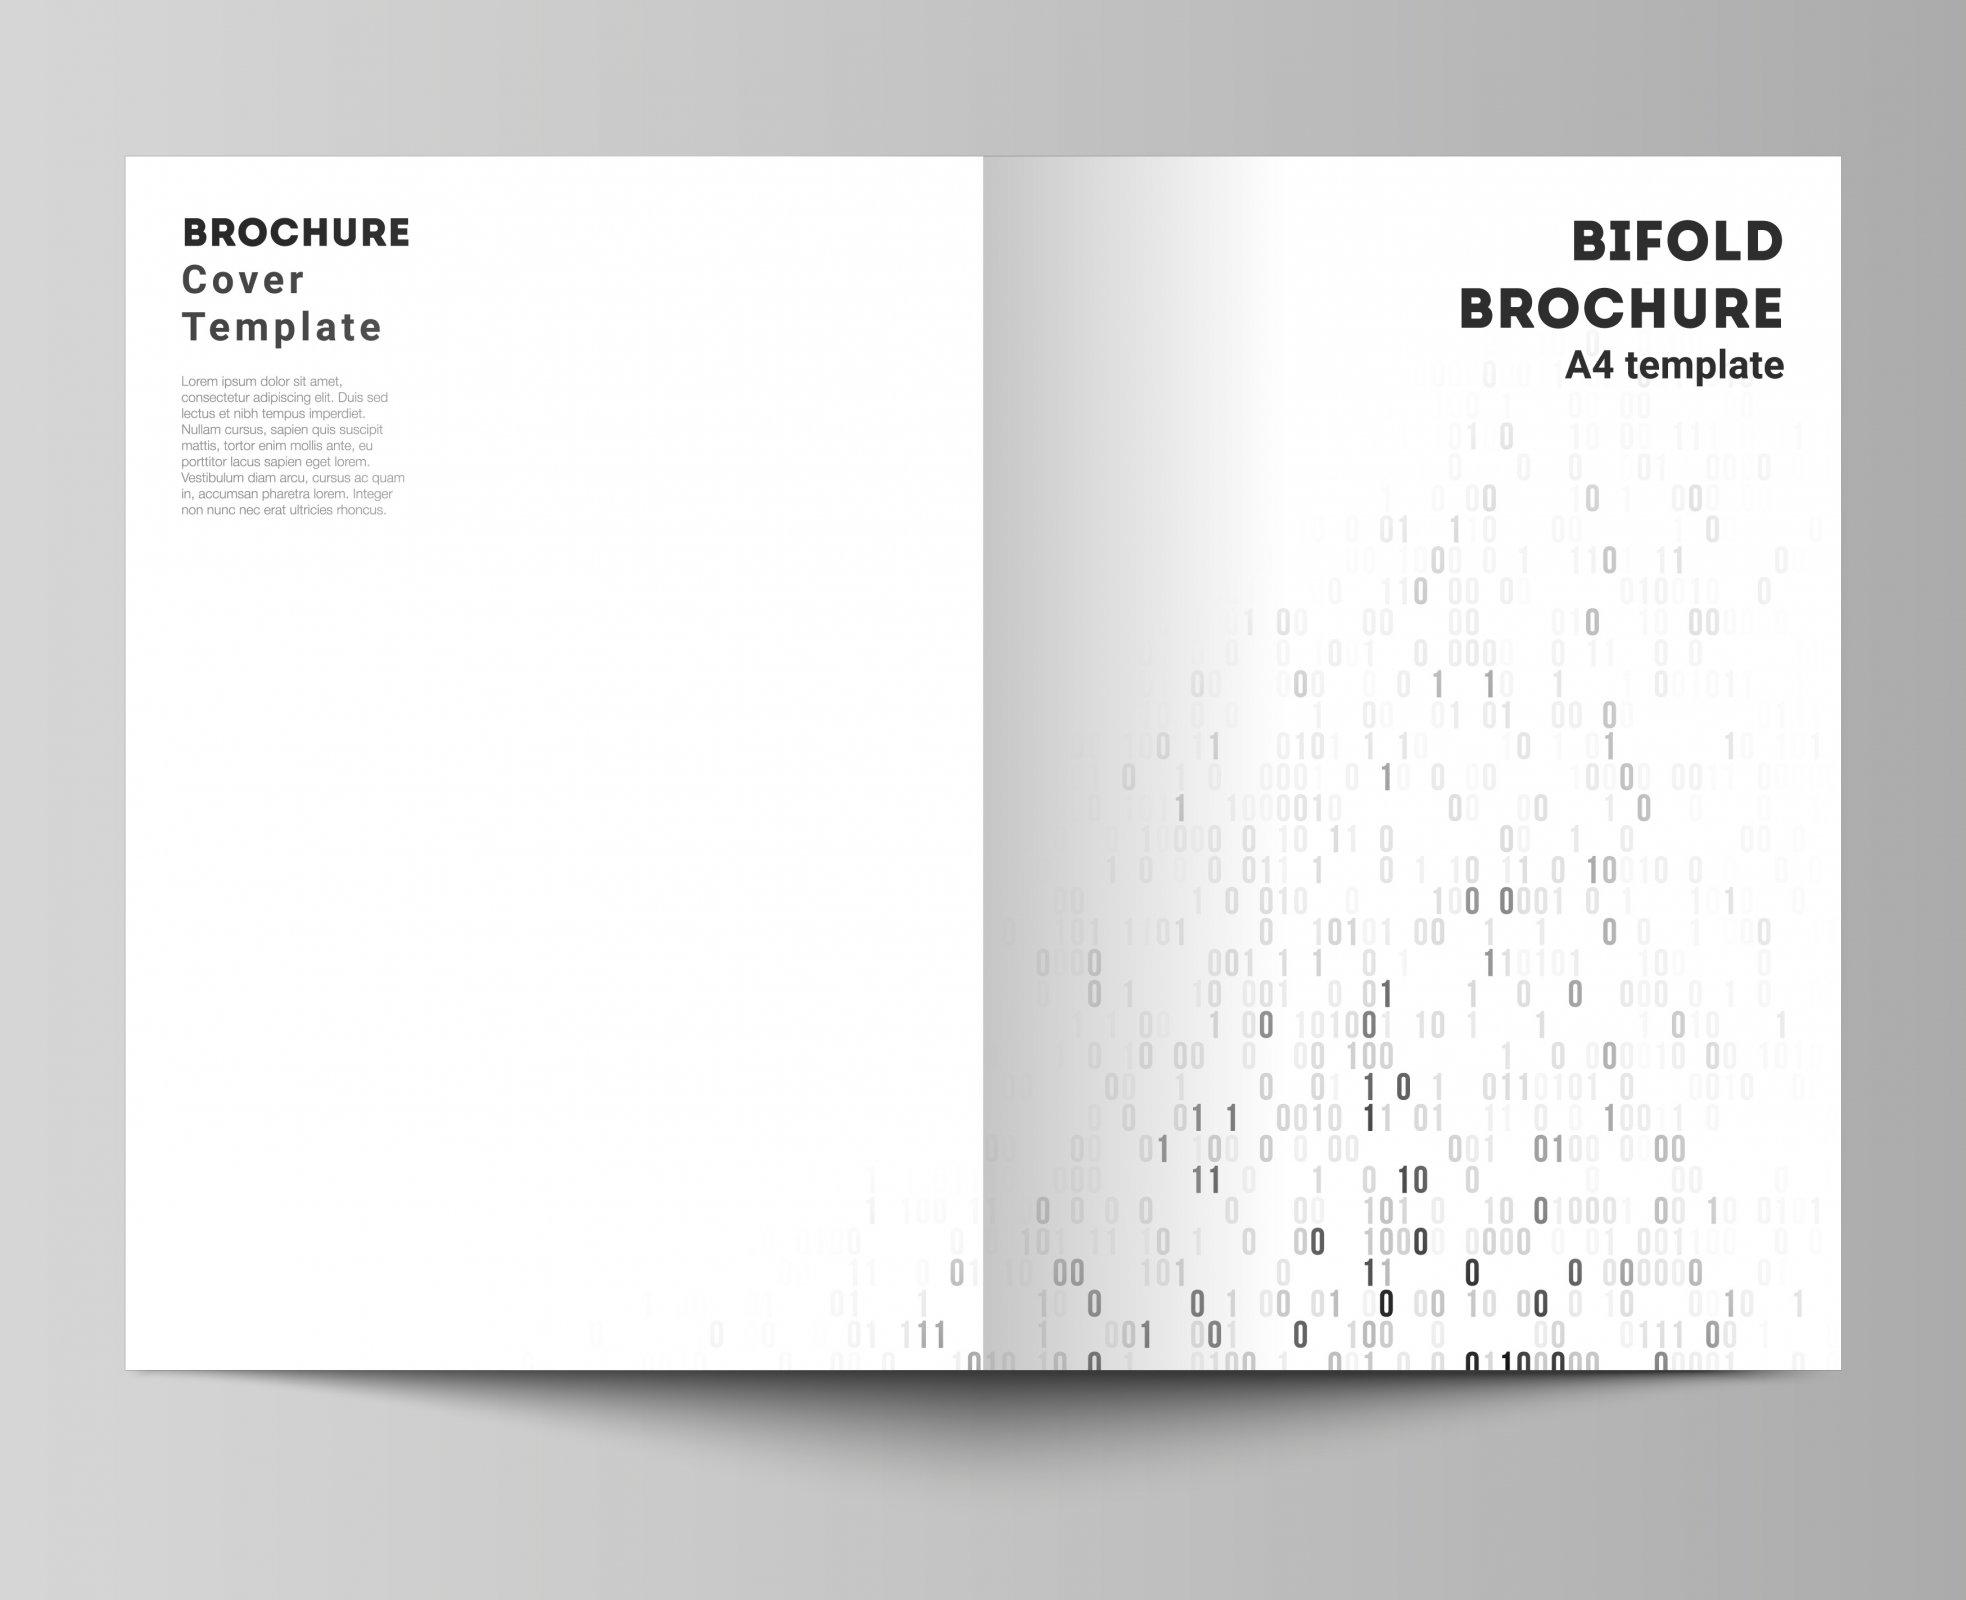 Brochures/Programs Single 8.5x11 Half Fold Black Printing Options (no bleed) Machine or Hand Folding